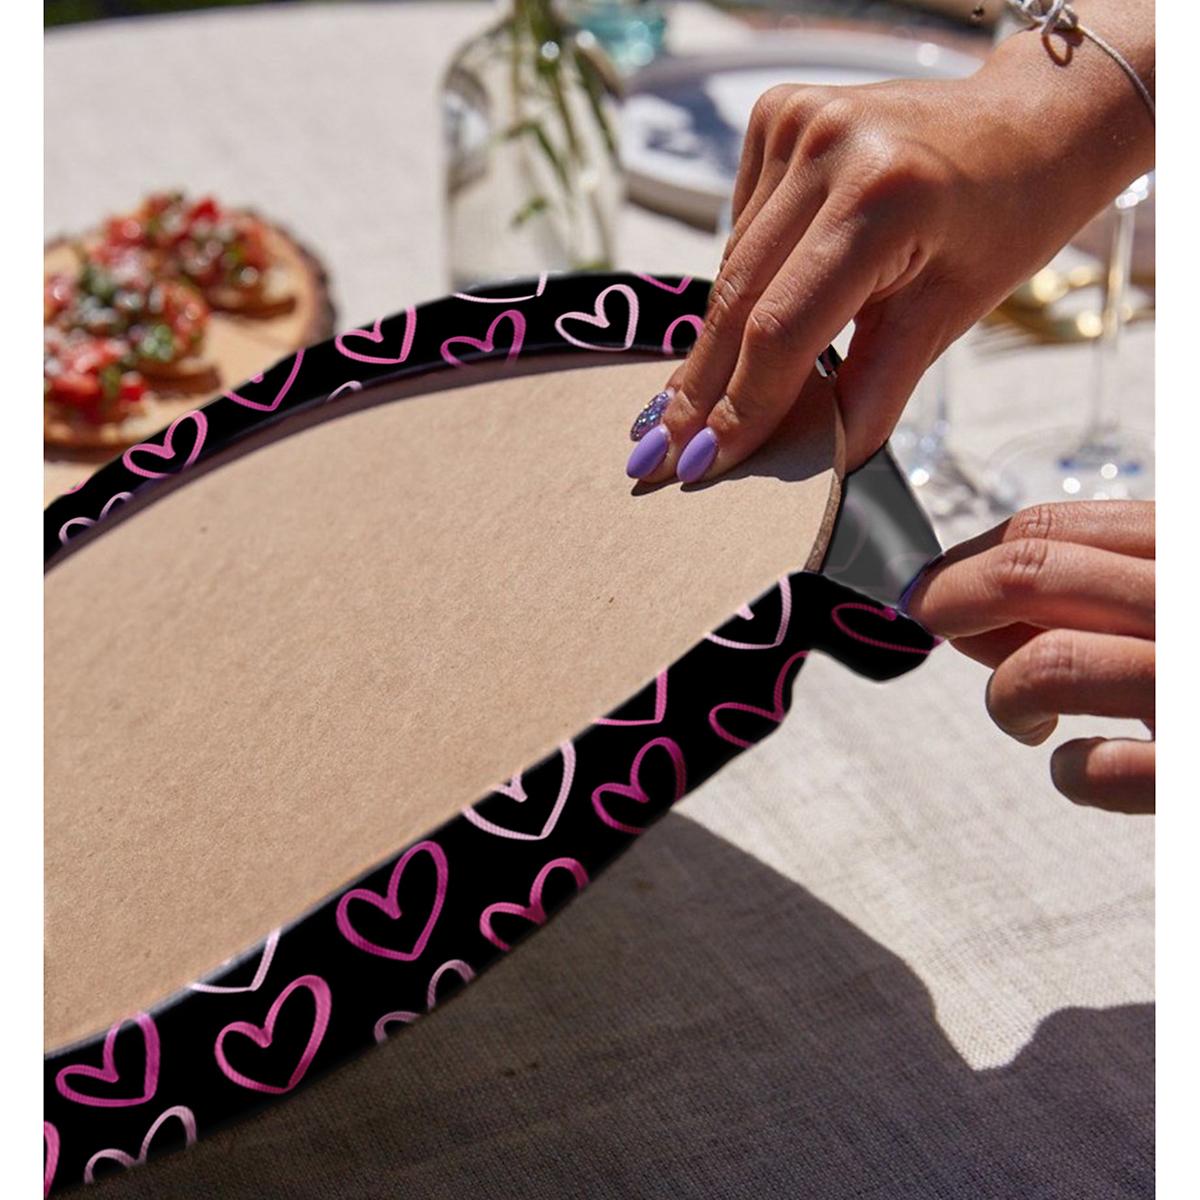 Realhomes Sevgililer Günü Temalı Özel Tasarım Dijital Baskılı Modern 2'li Yuvarlak Servis Altlığı - Supla Realhomes